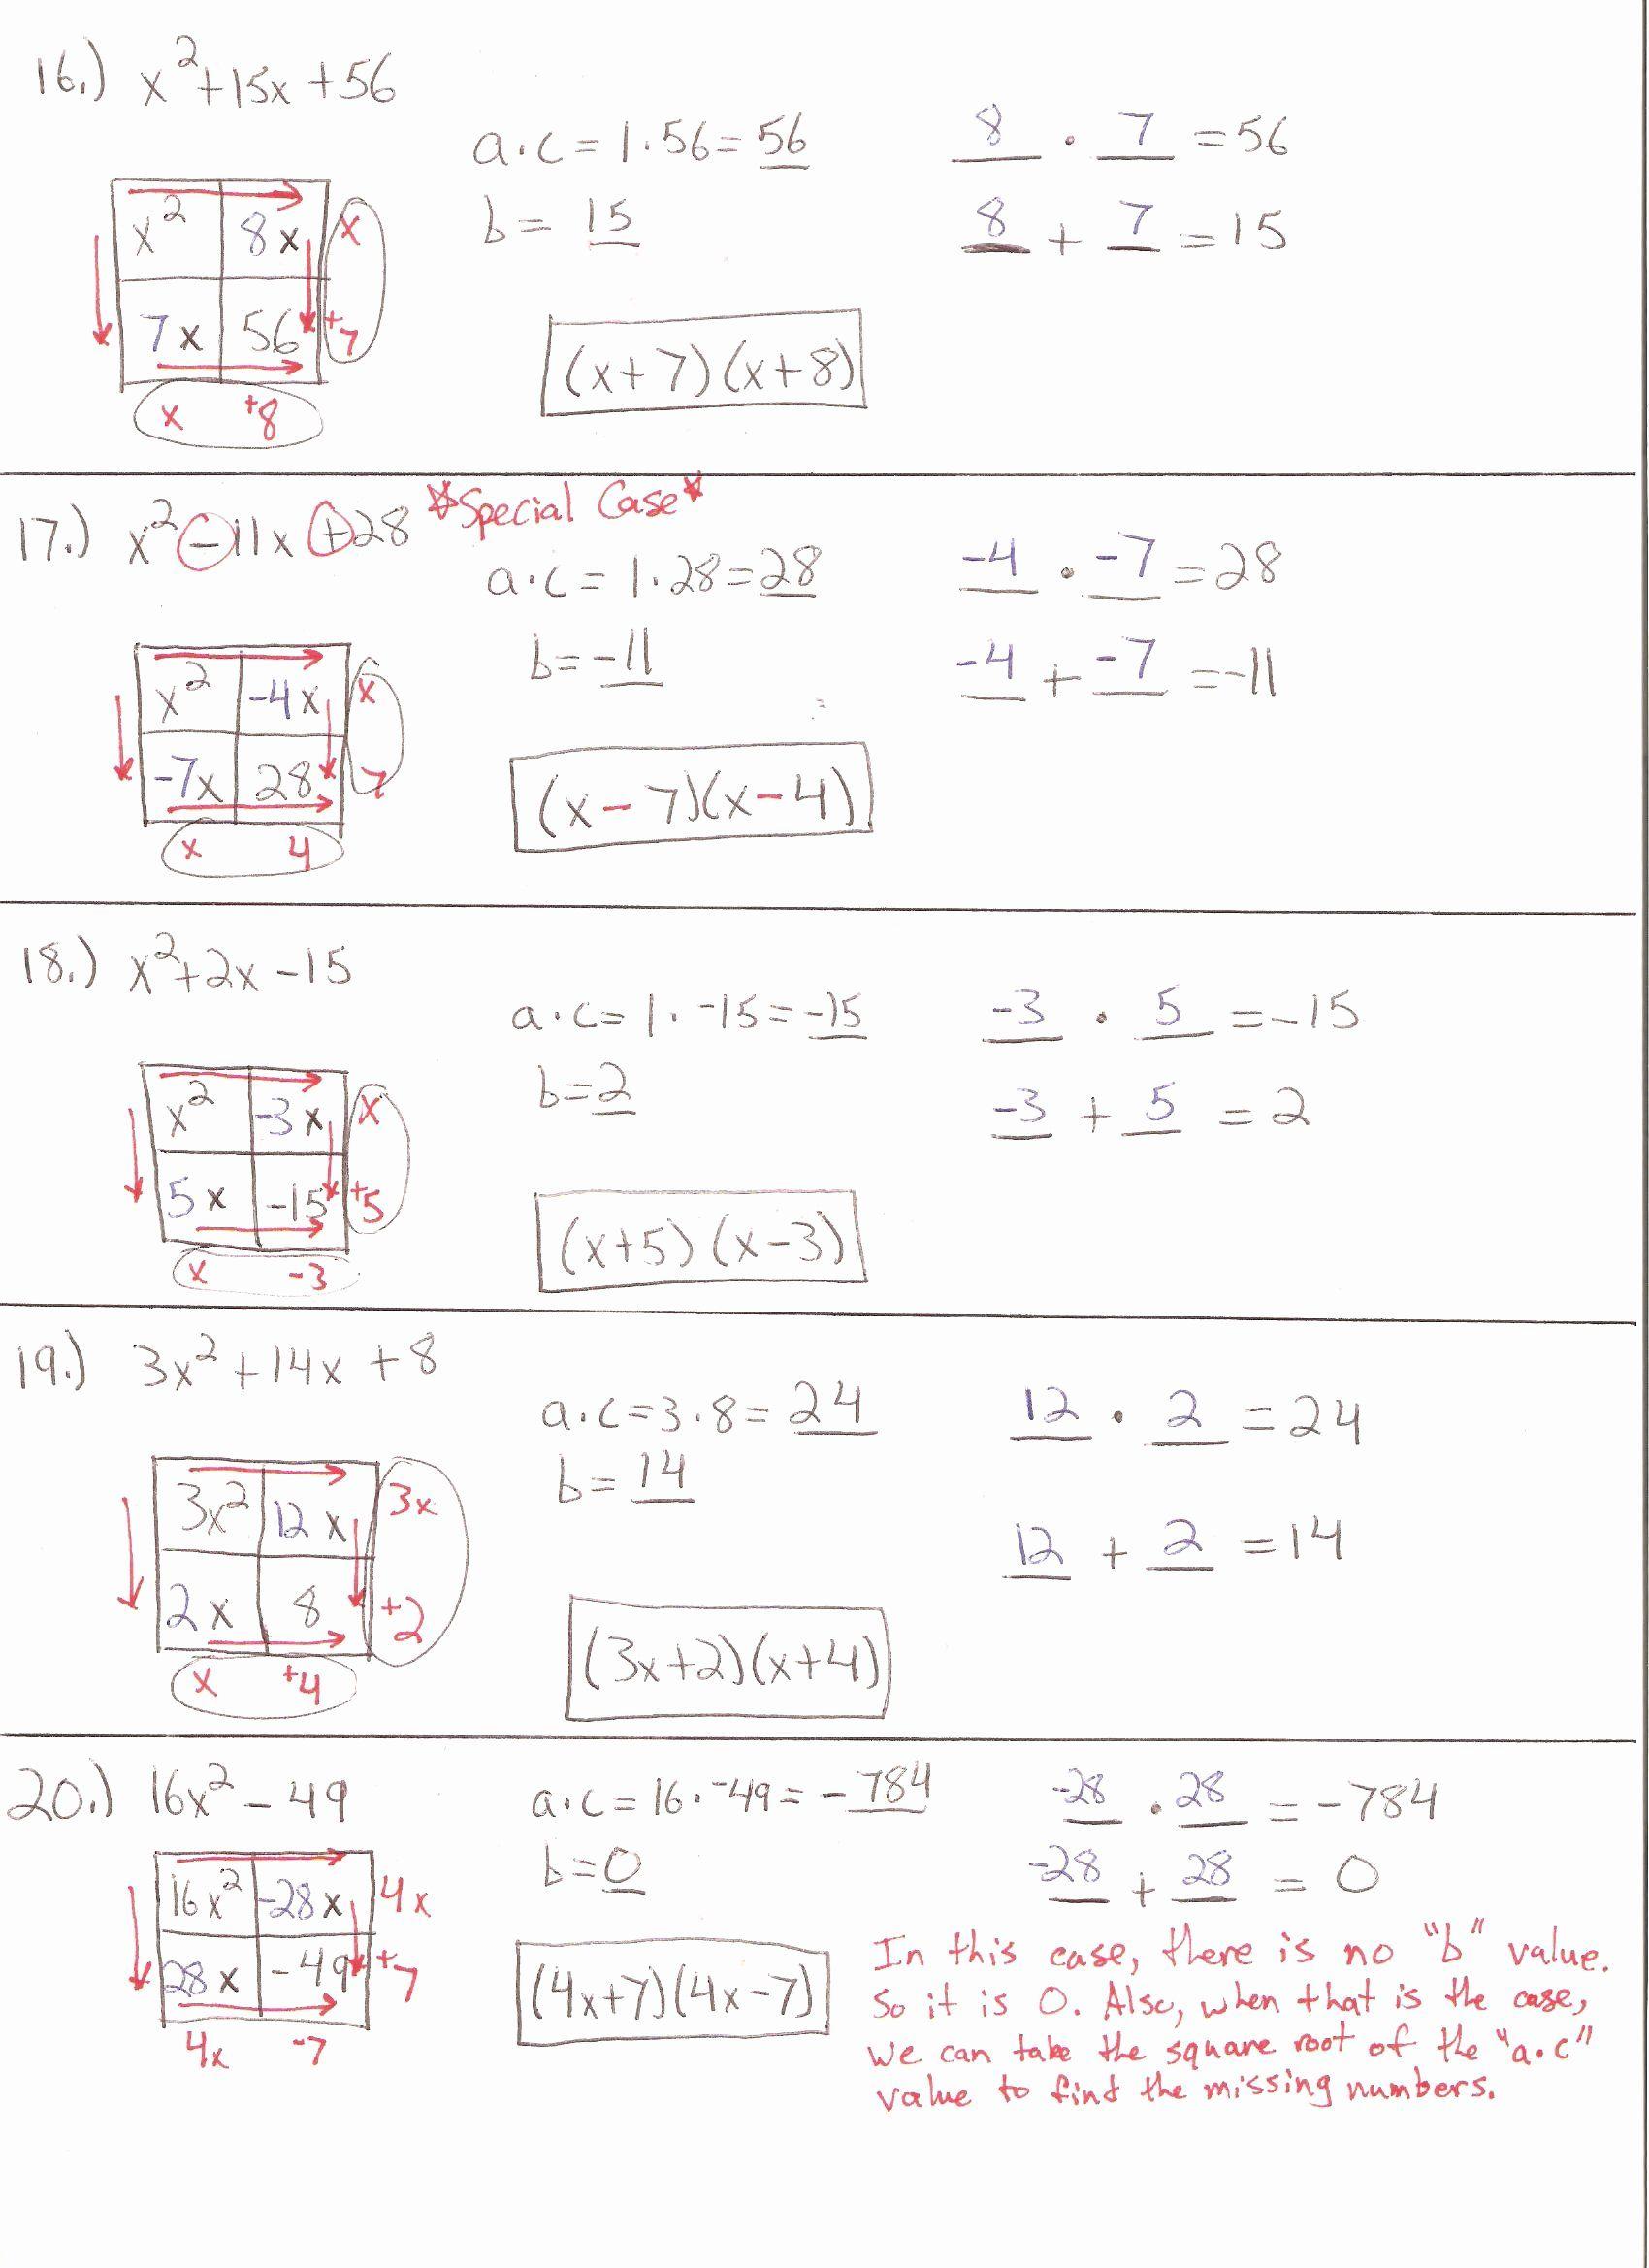 Factoring Quadratic Equations Worksheet Fresh Factoring Quadratic Trinomials Worksheet For 9th 10th In 2020 Quadratics Algebra Worksheets Solving Quadratic Equations